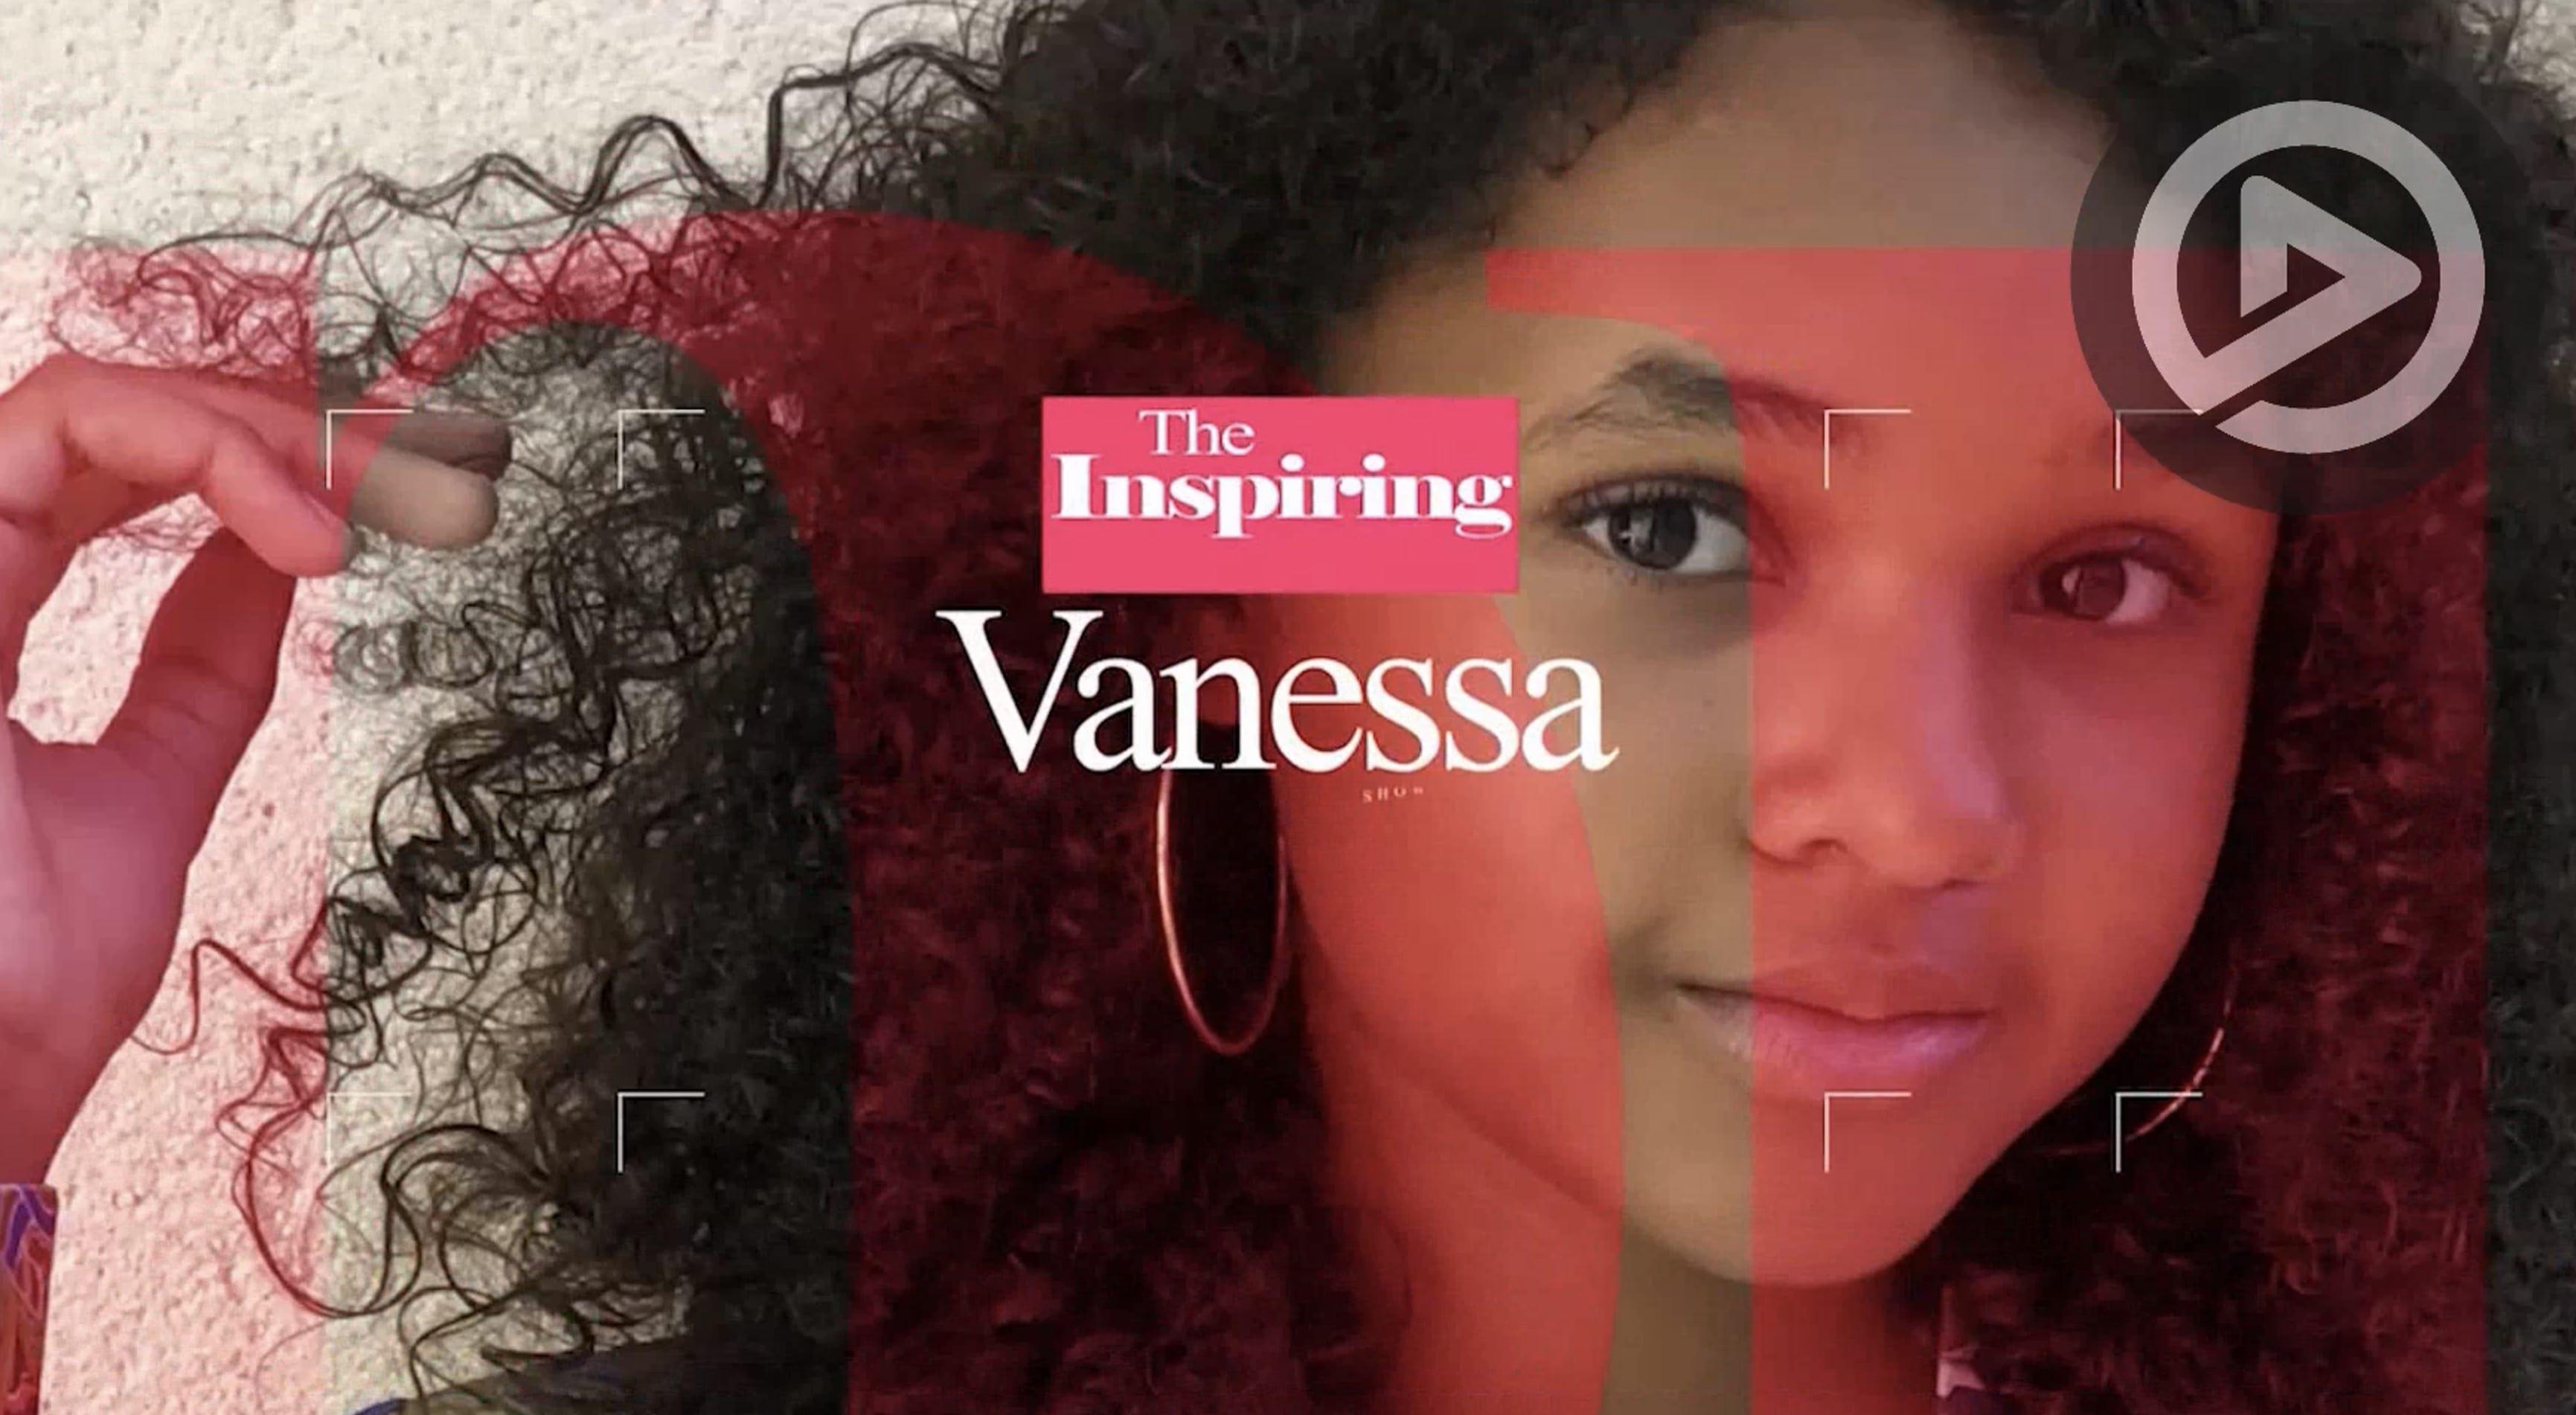 The Inspiring Vanessa Show